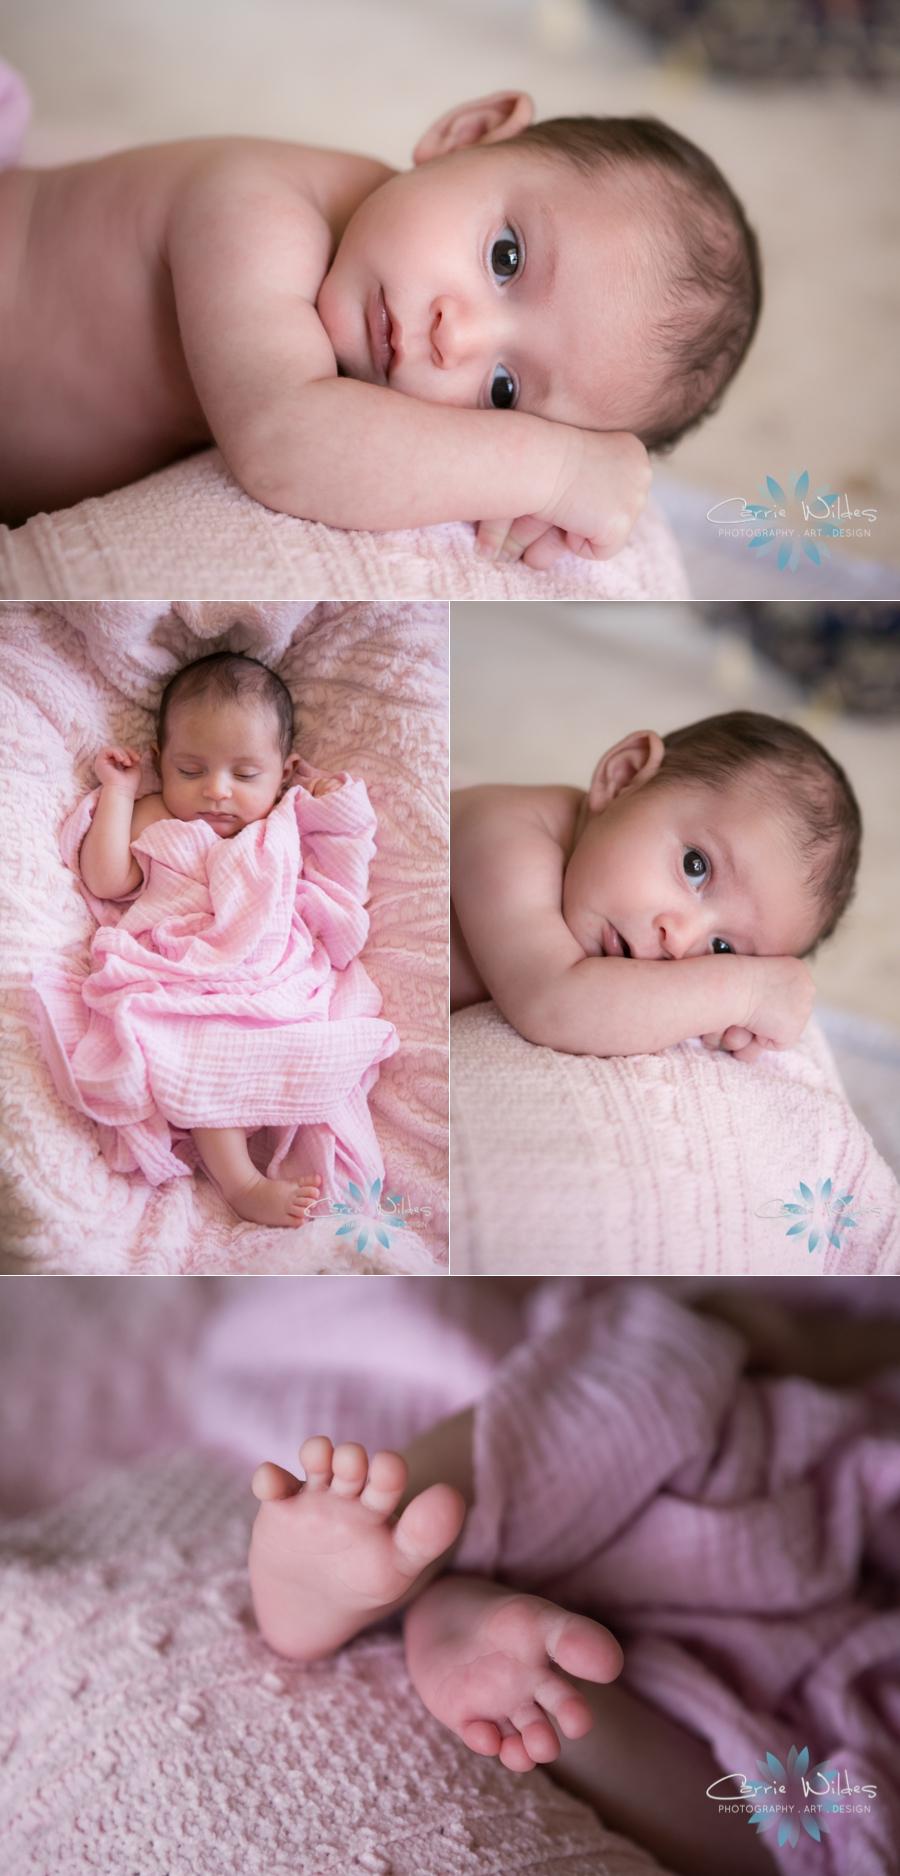 5_31_17 Laila Tampa Newborn Portraits_0020.jpg